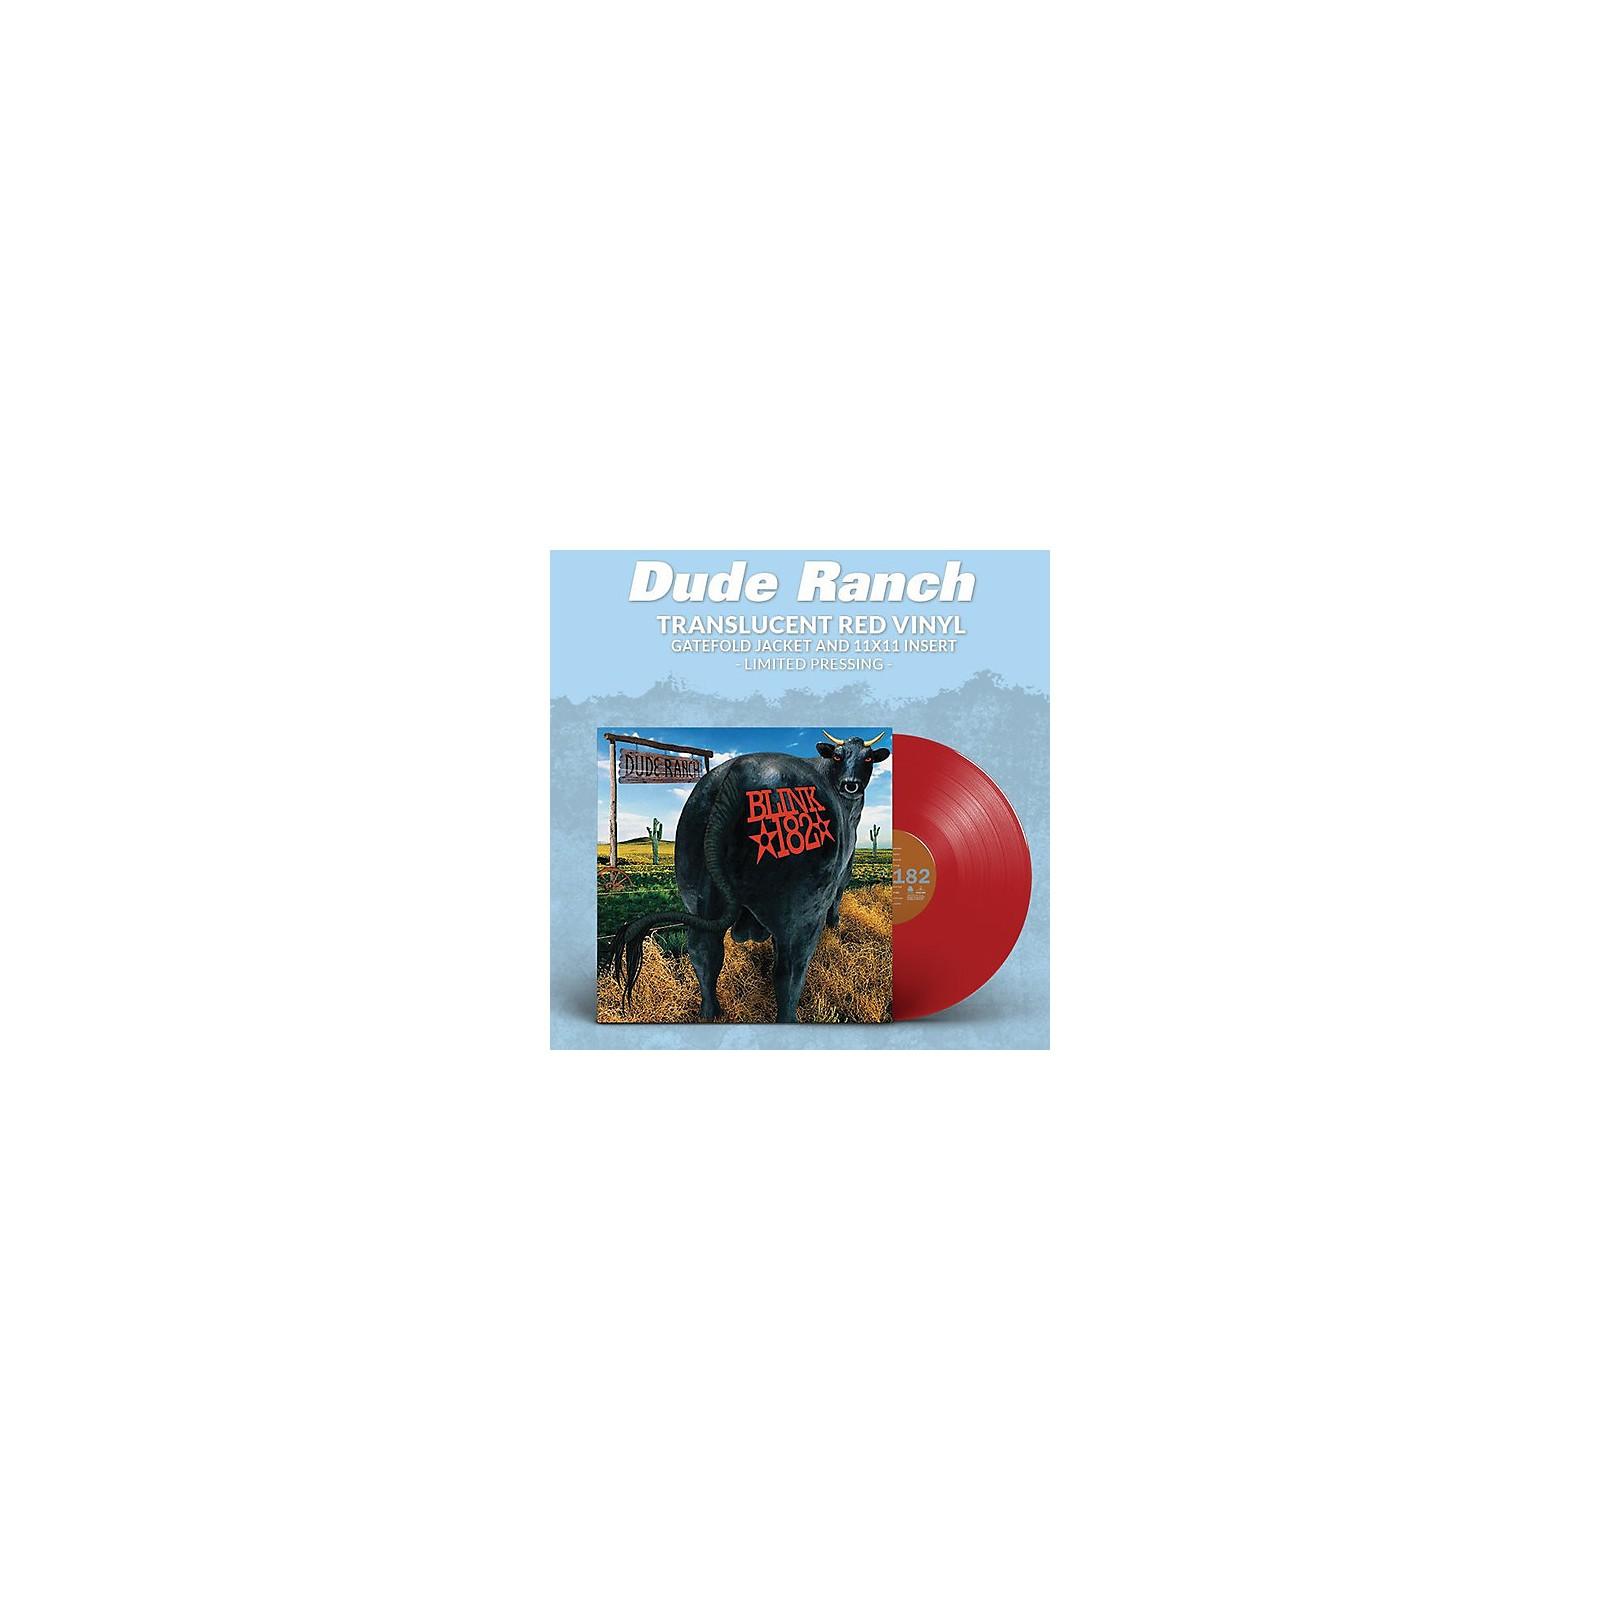 Alliance blink-182 - Dude Ranch